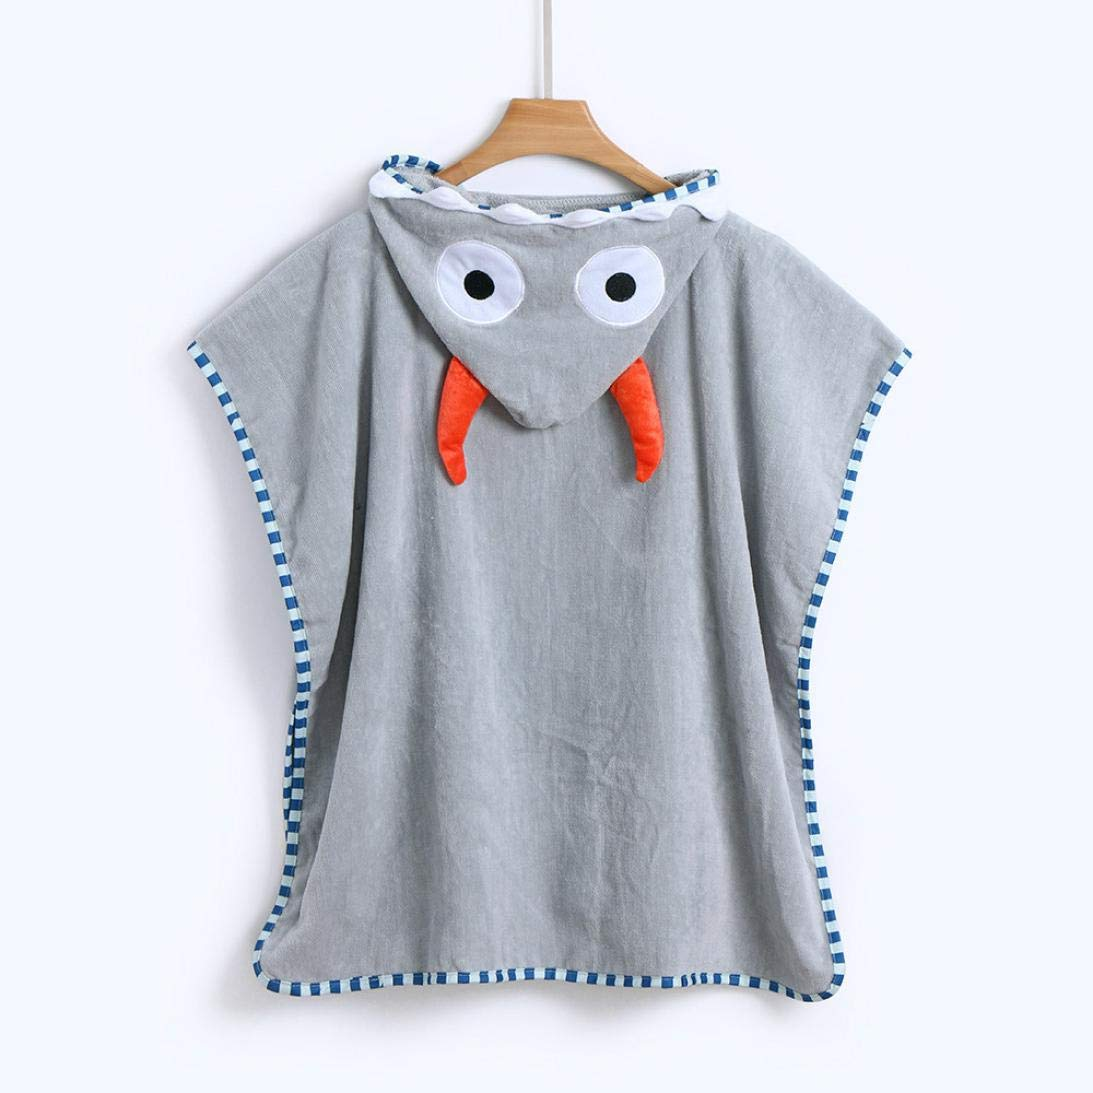 AutumnFall Kids Soft Bathrobe Comfy Cartoon Animals Hooded Cotton Robe Unisex Baby Hooded Gift All Seasons Sleepwear Bath Towel (1-7 Years Old Baby, Pink) AutumnFall®